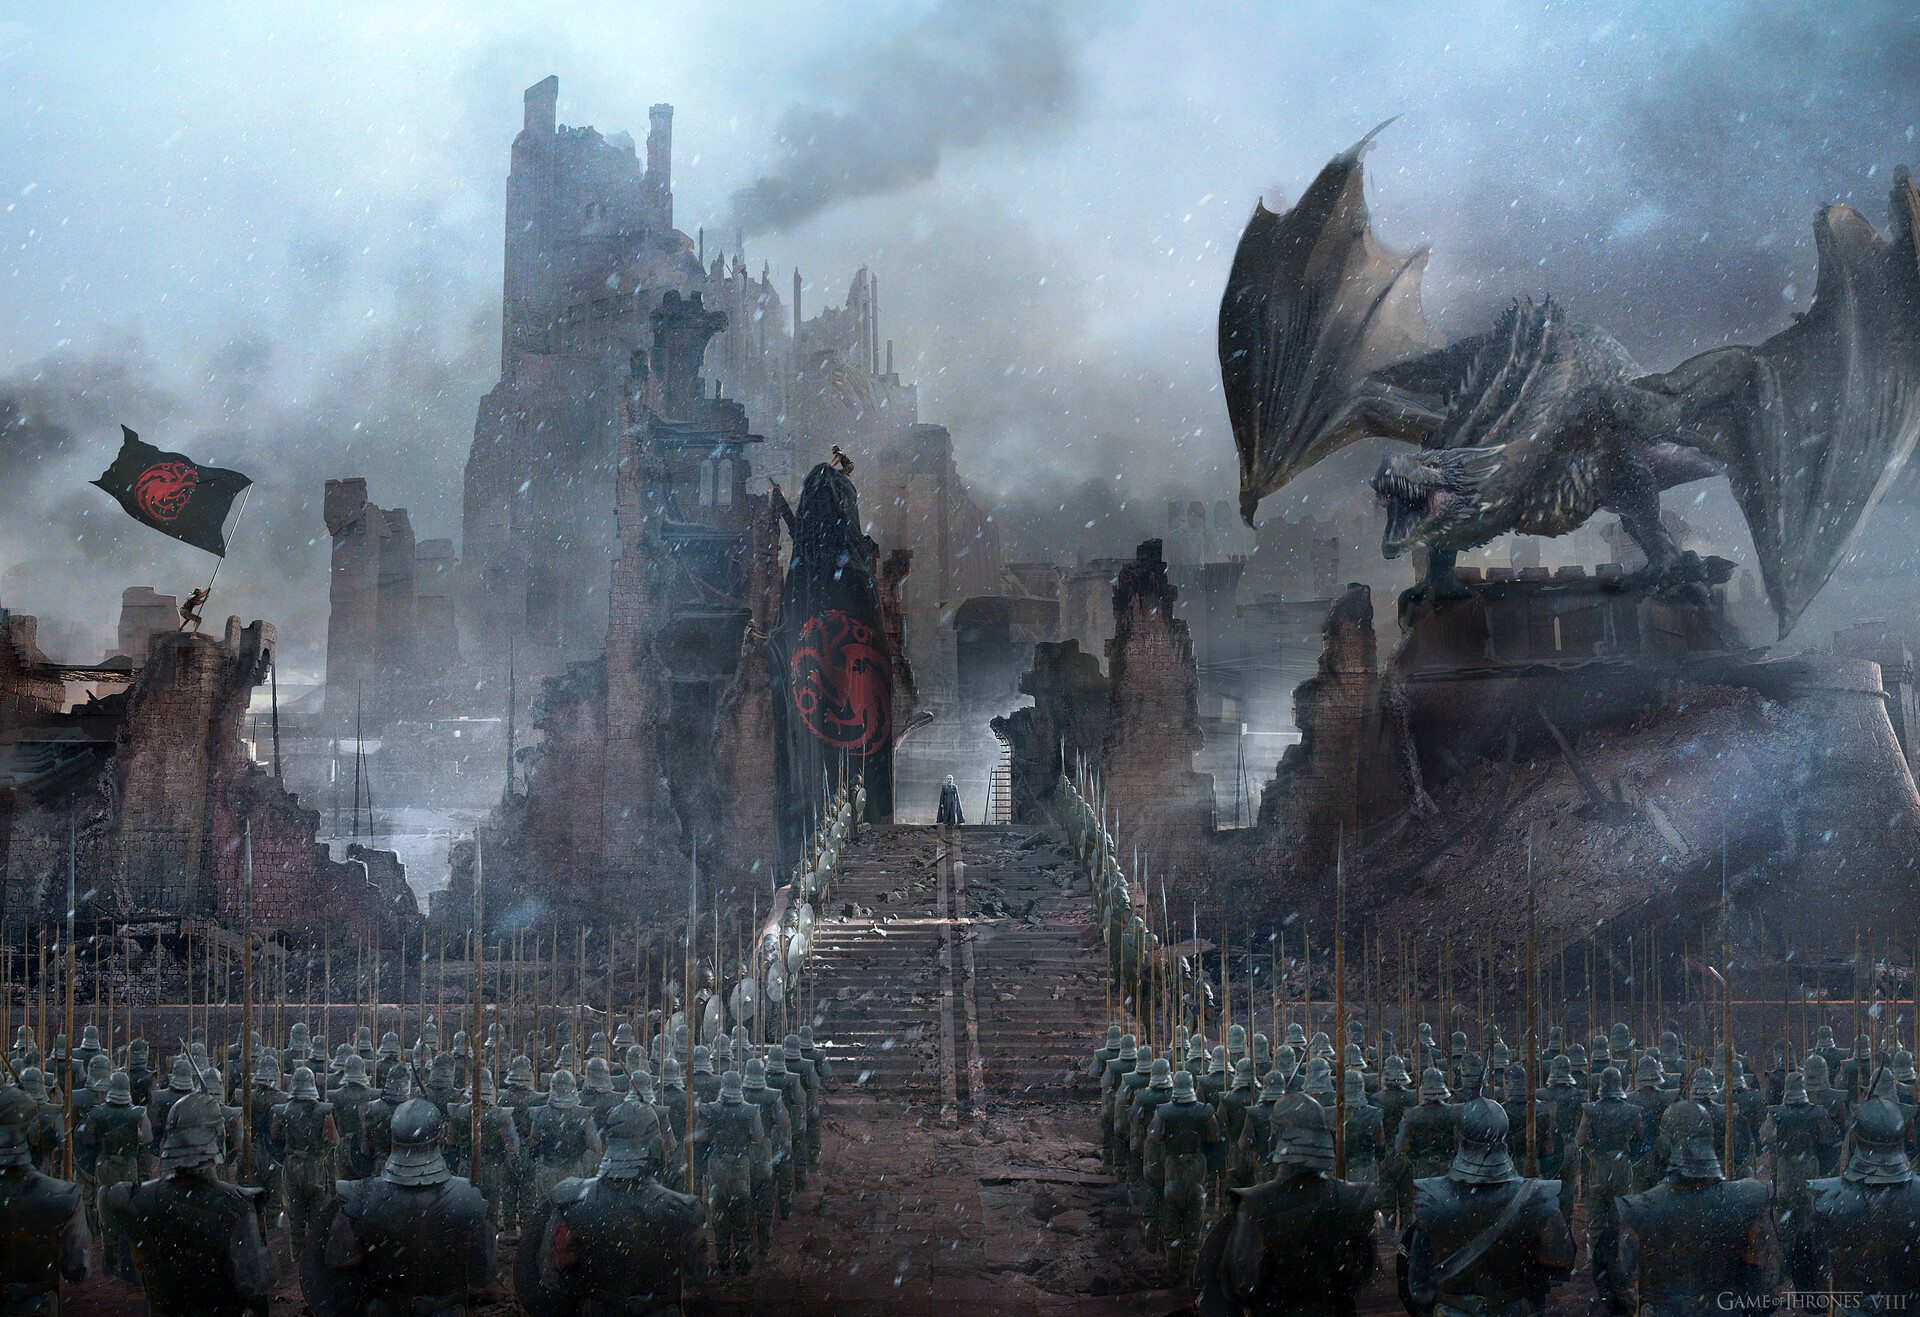 Kieran belshaw redkeepgate ruins danyspeech 20ft moredamage v011copy